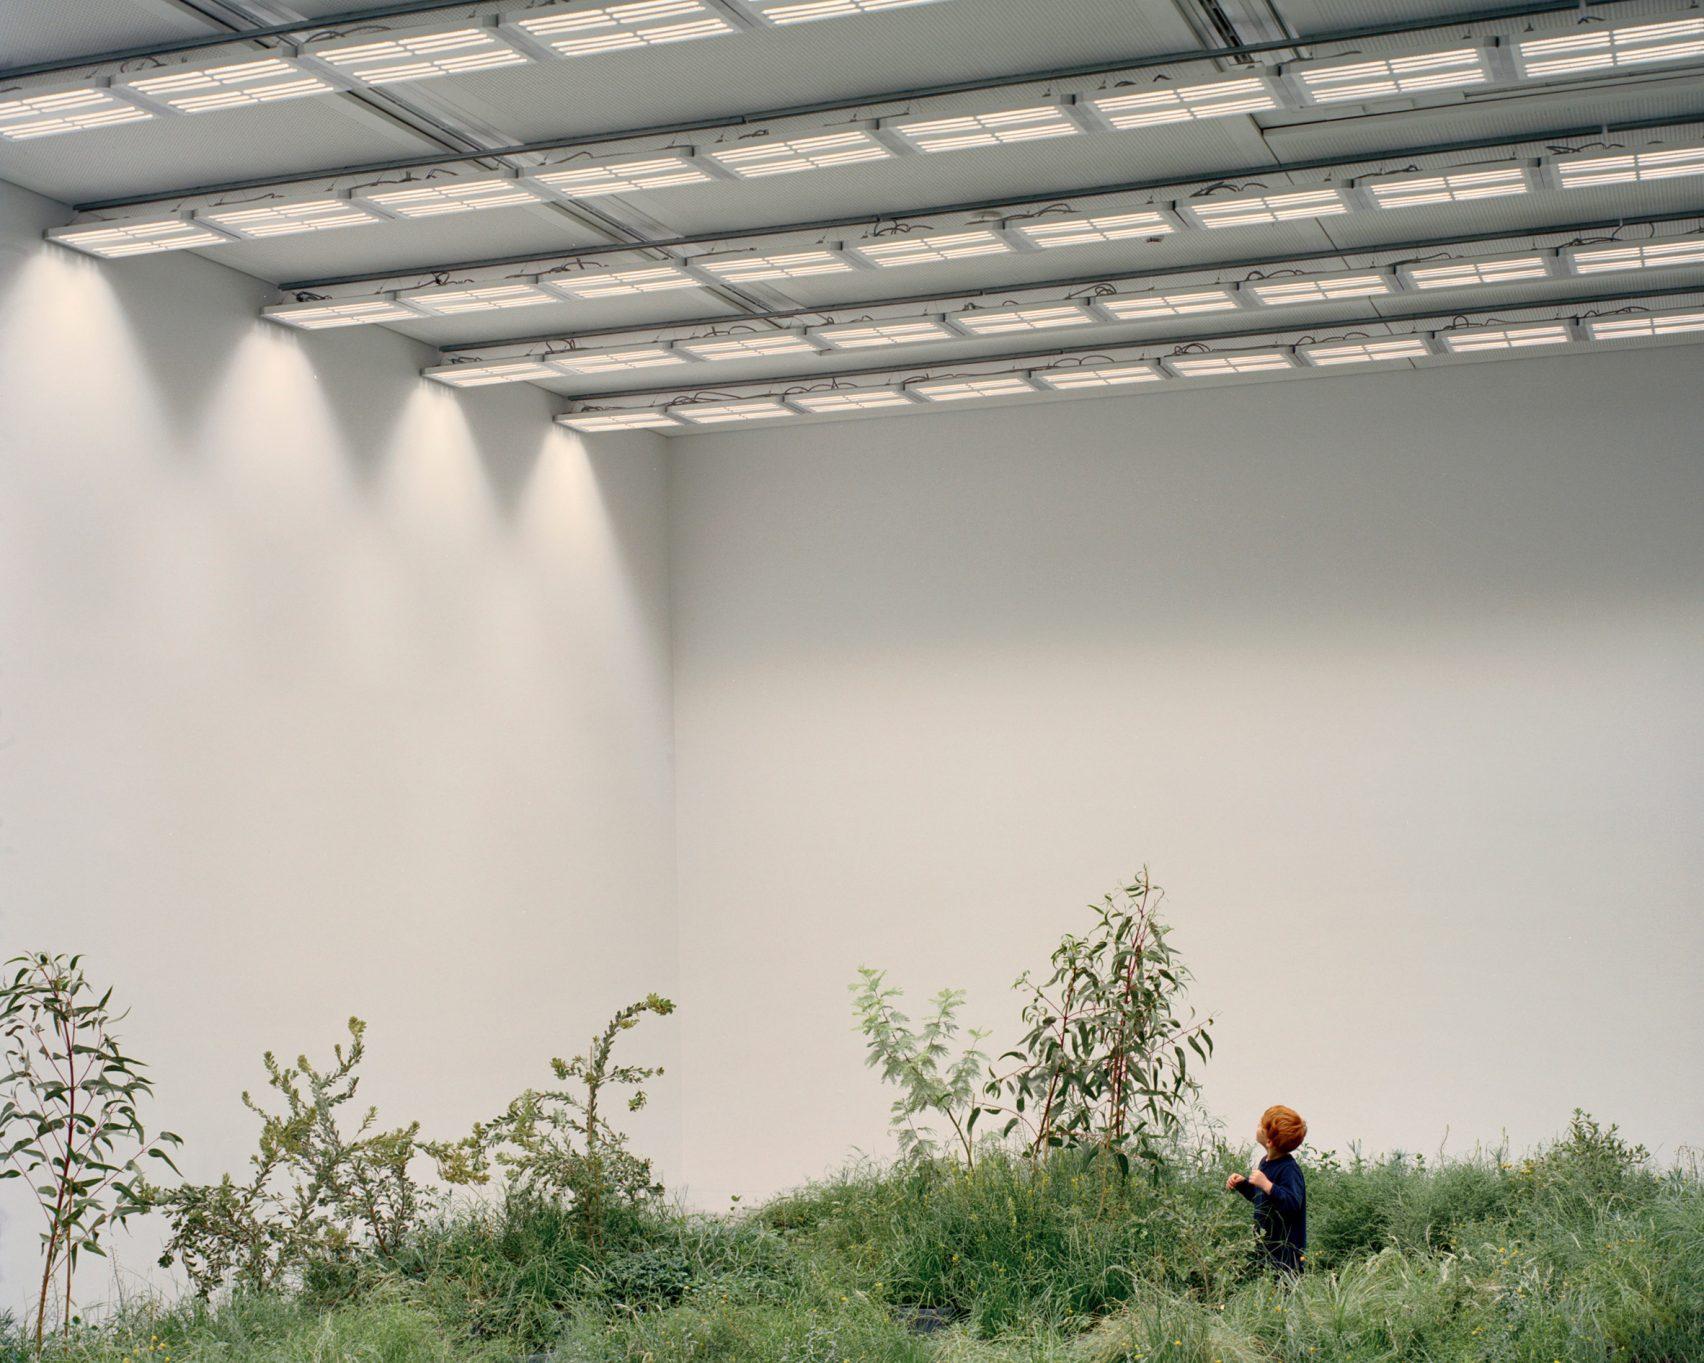 Grasslands-Repair-Pabellon-Australia-Venecia-Baracco-Wright-Rory-Gardiner-02